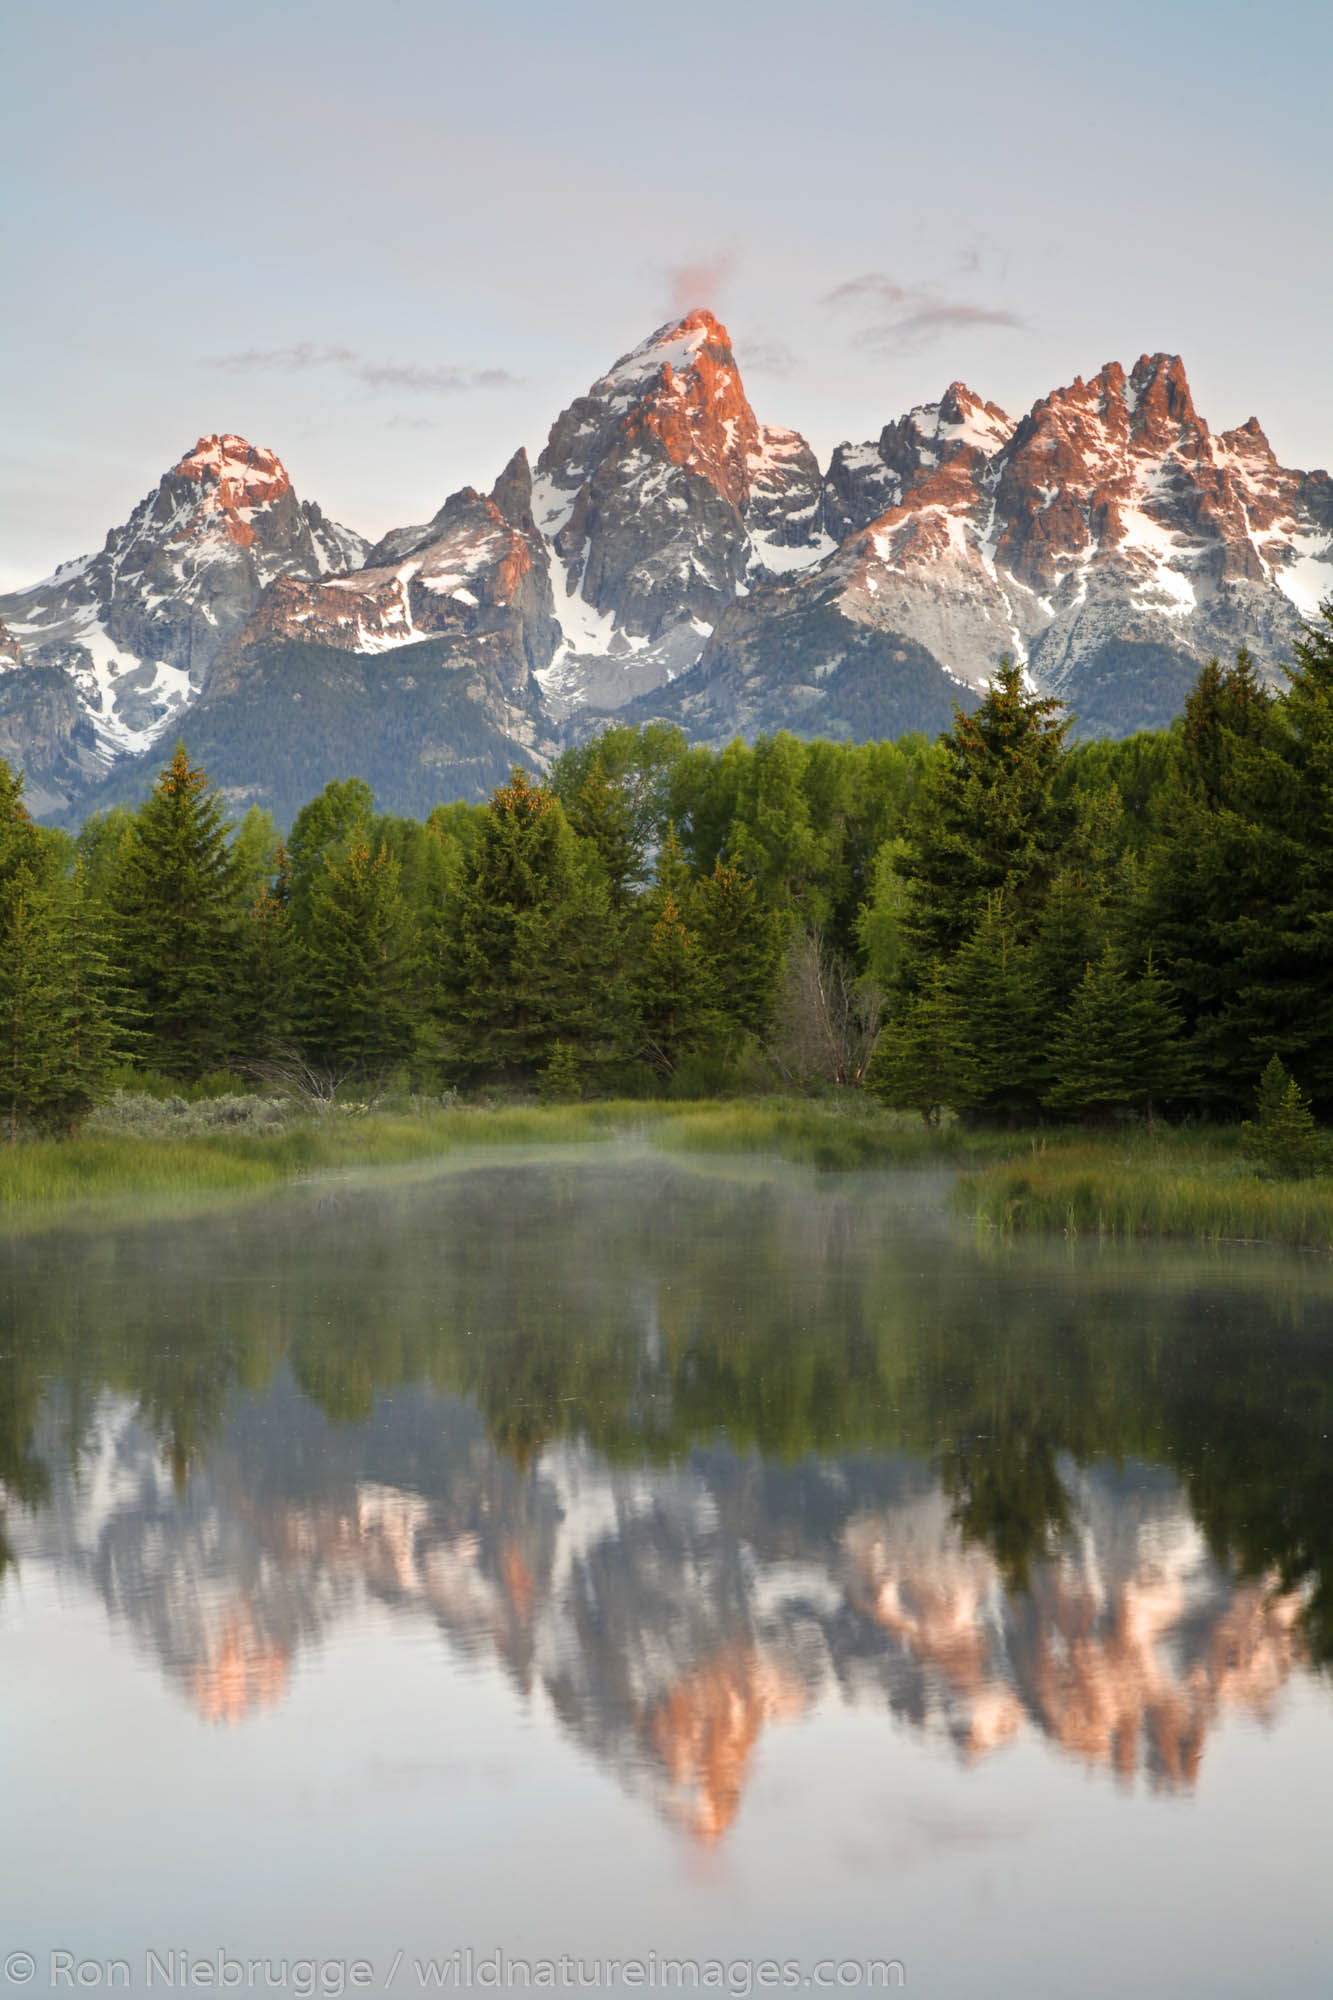 Grand Teton from Schwabacher Landing, Grand Teton National Park, Wyoming.